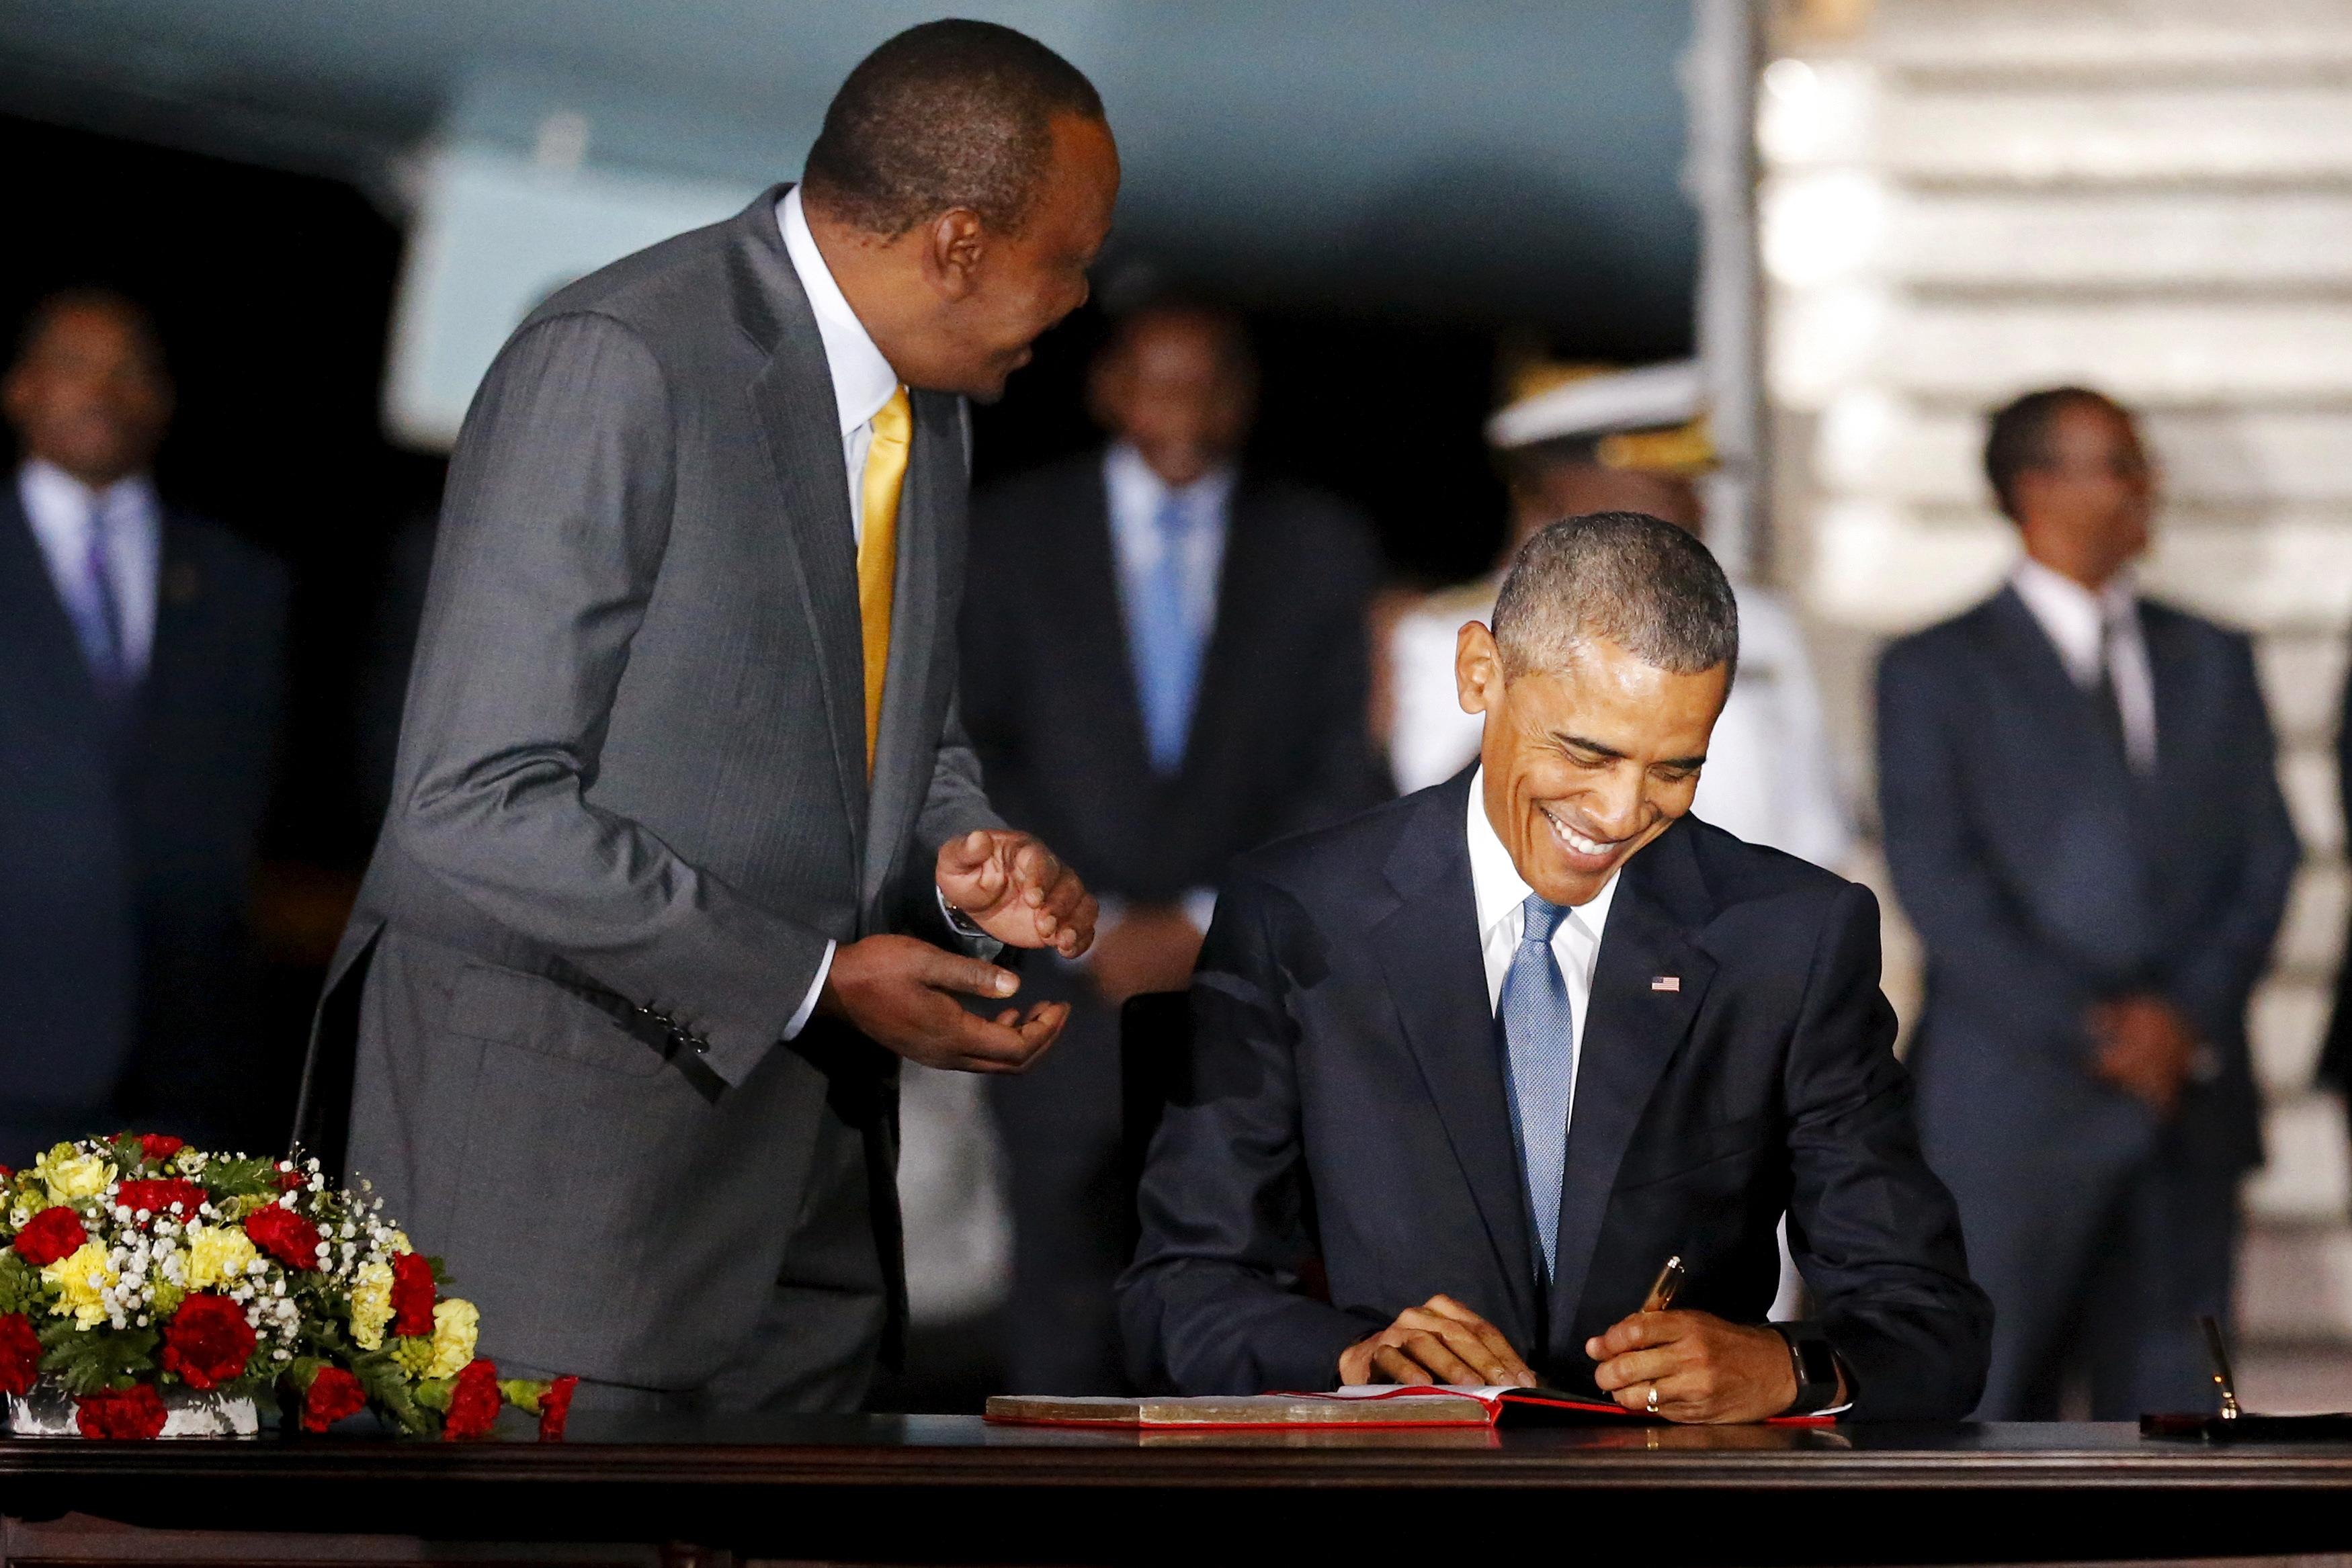 Kenya's President Uhuru Kenyatta (L) looks on as U.S. President Barack Obama signs a guest book as he arrives aboard Air Force One at Jomo Kenyatta International Airport in Nairobi July 24, 2015.